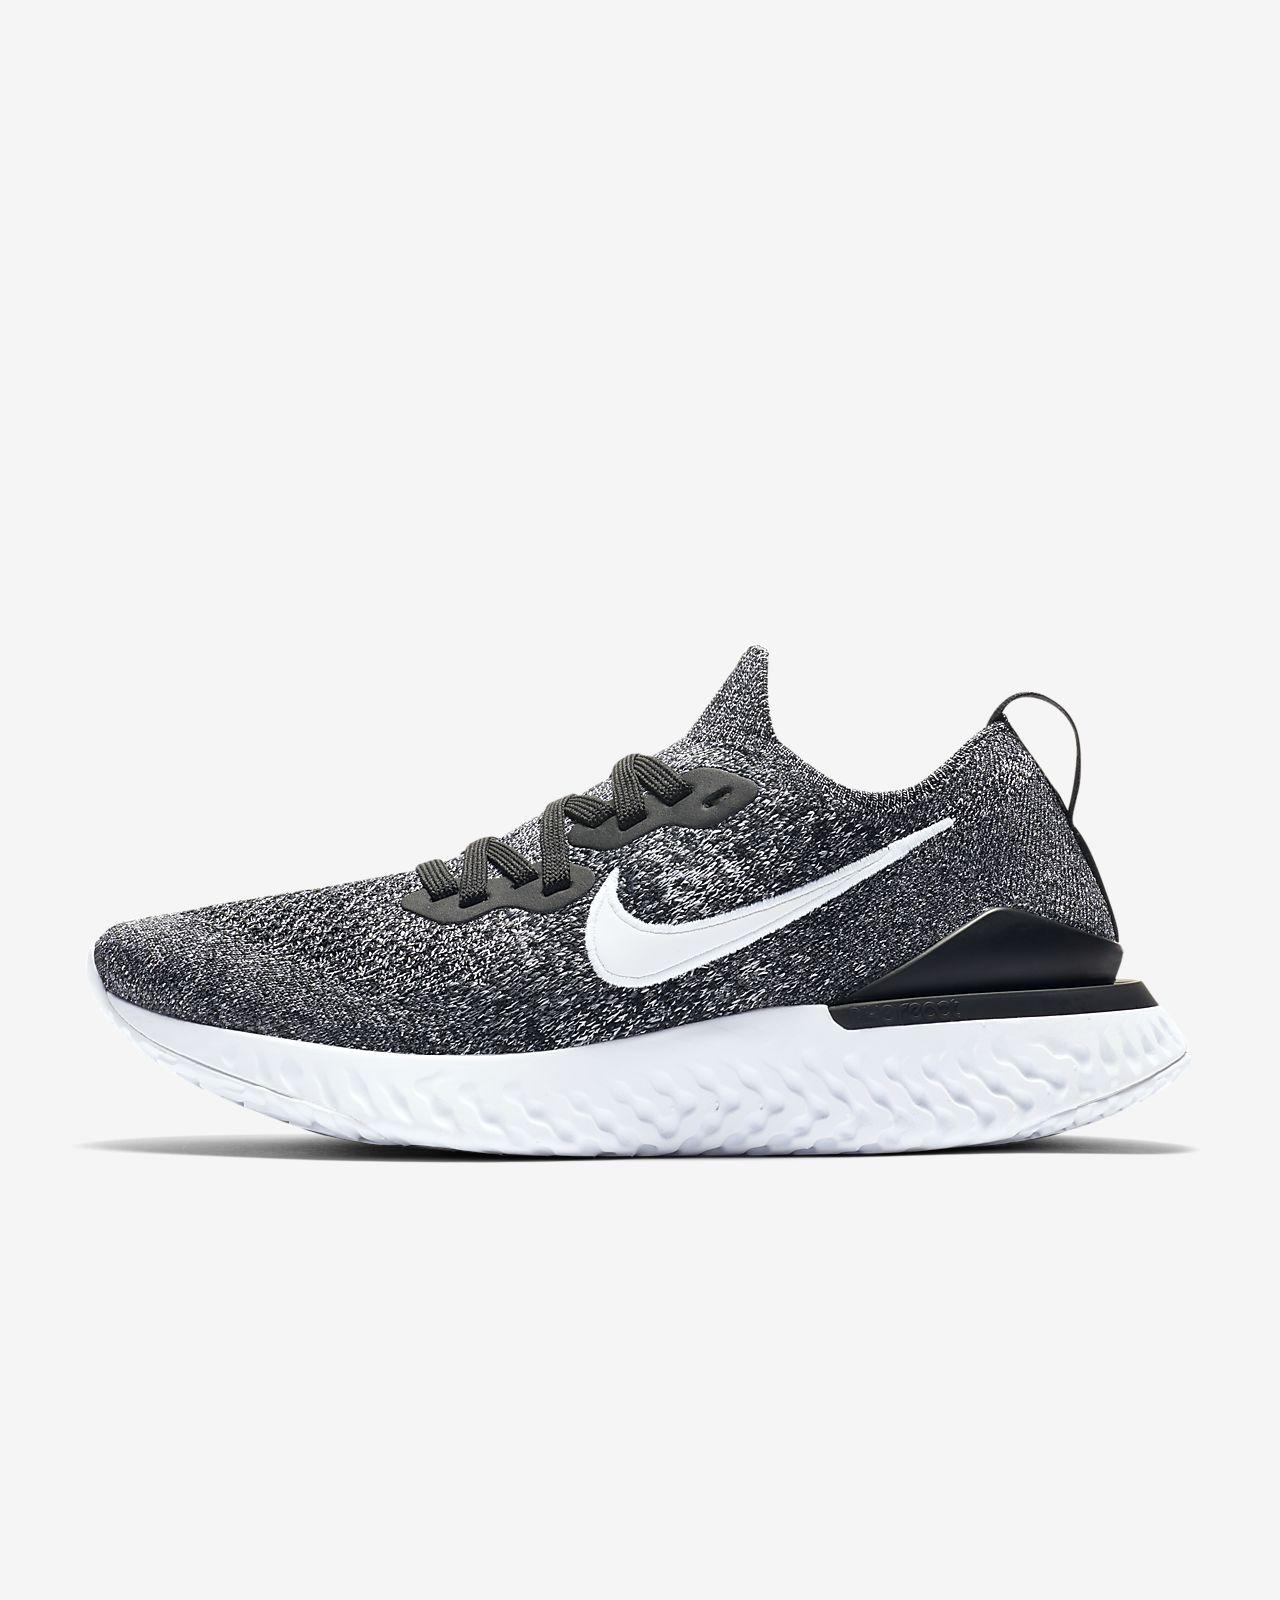 nike schuhe Billig, Nike laufshorts epic run schwarz sport